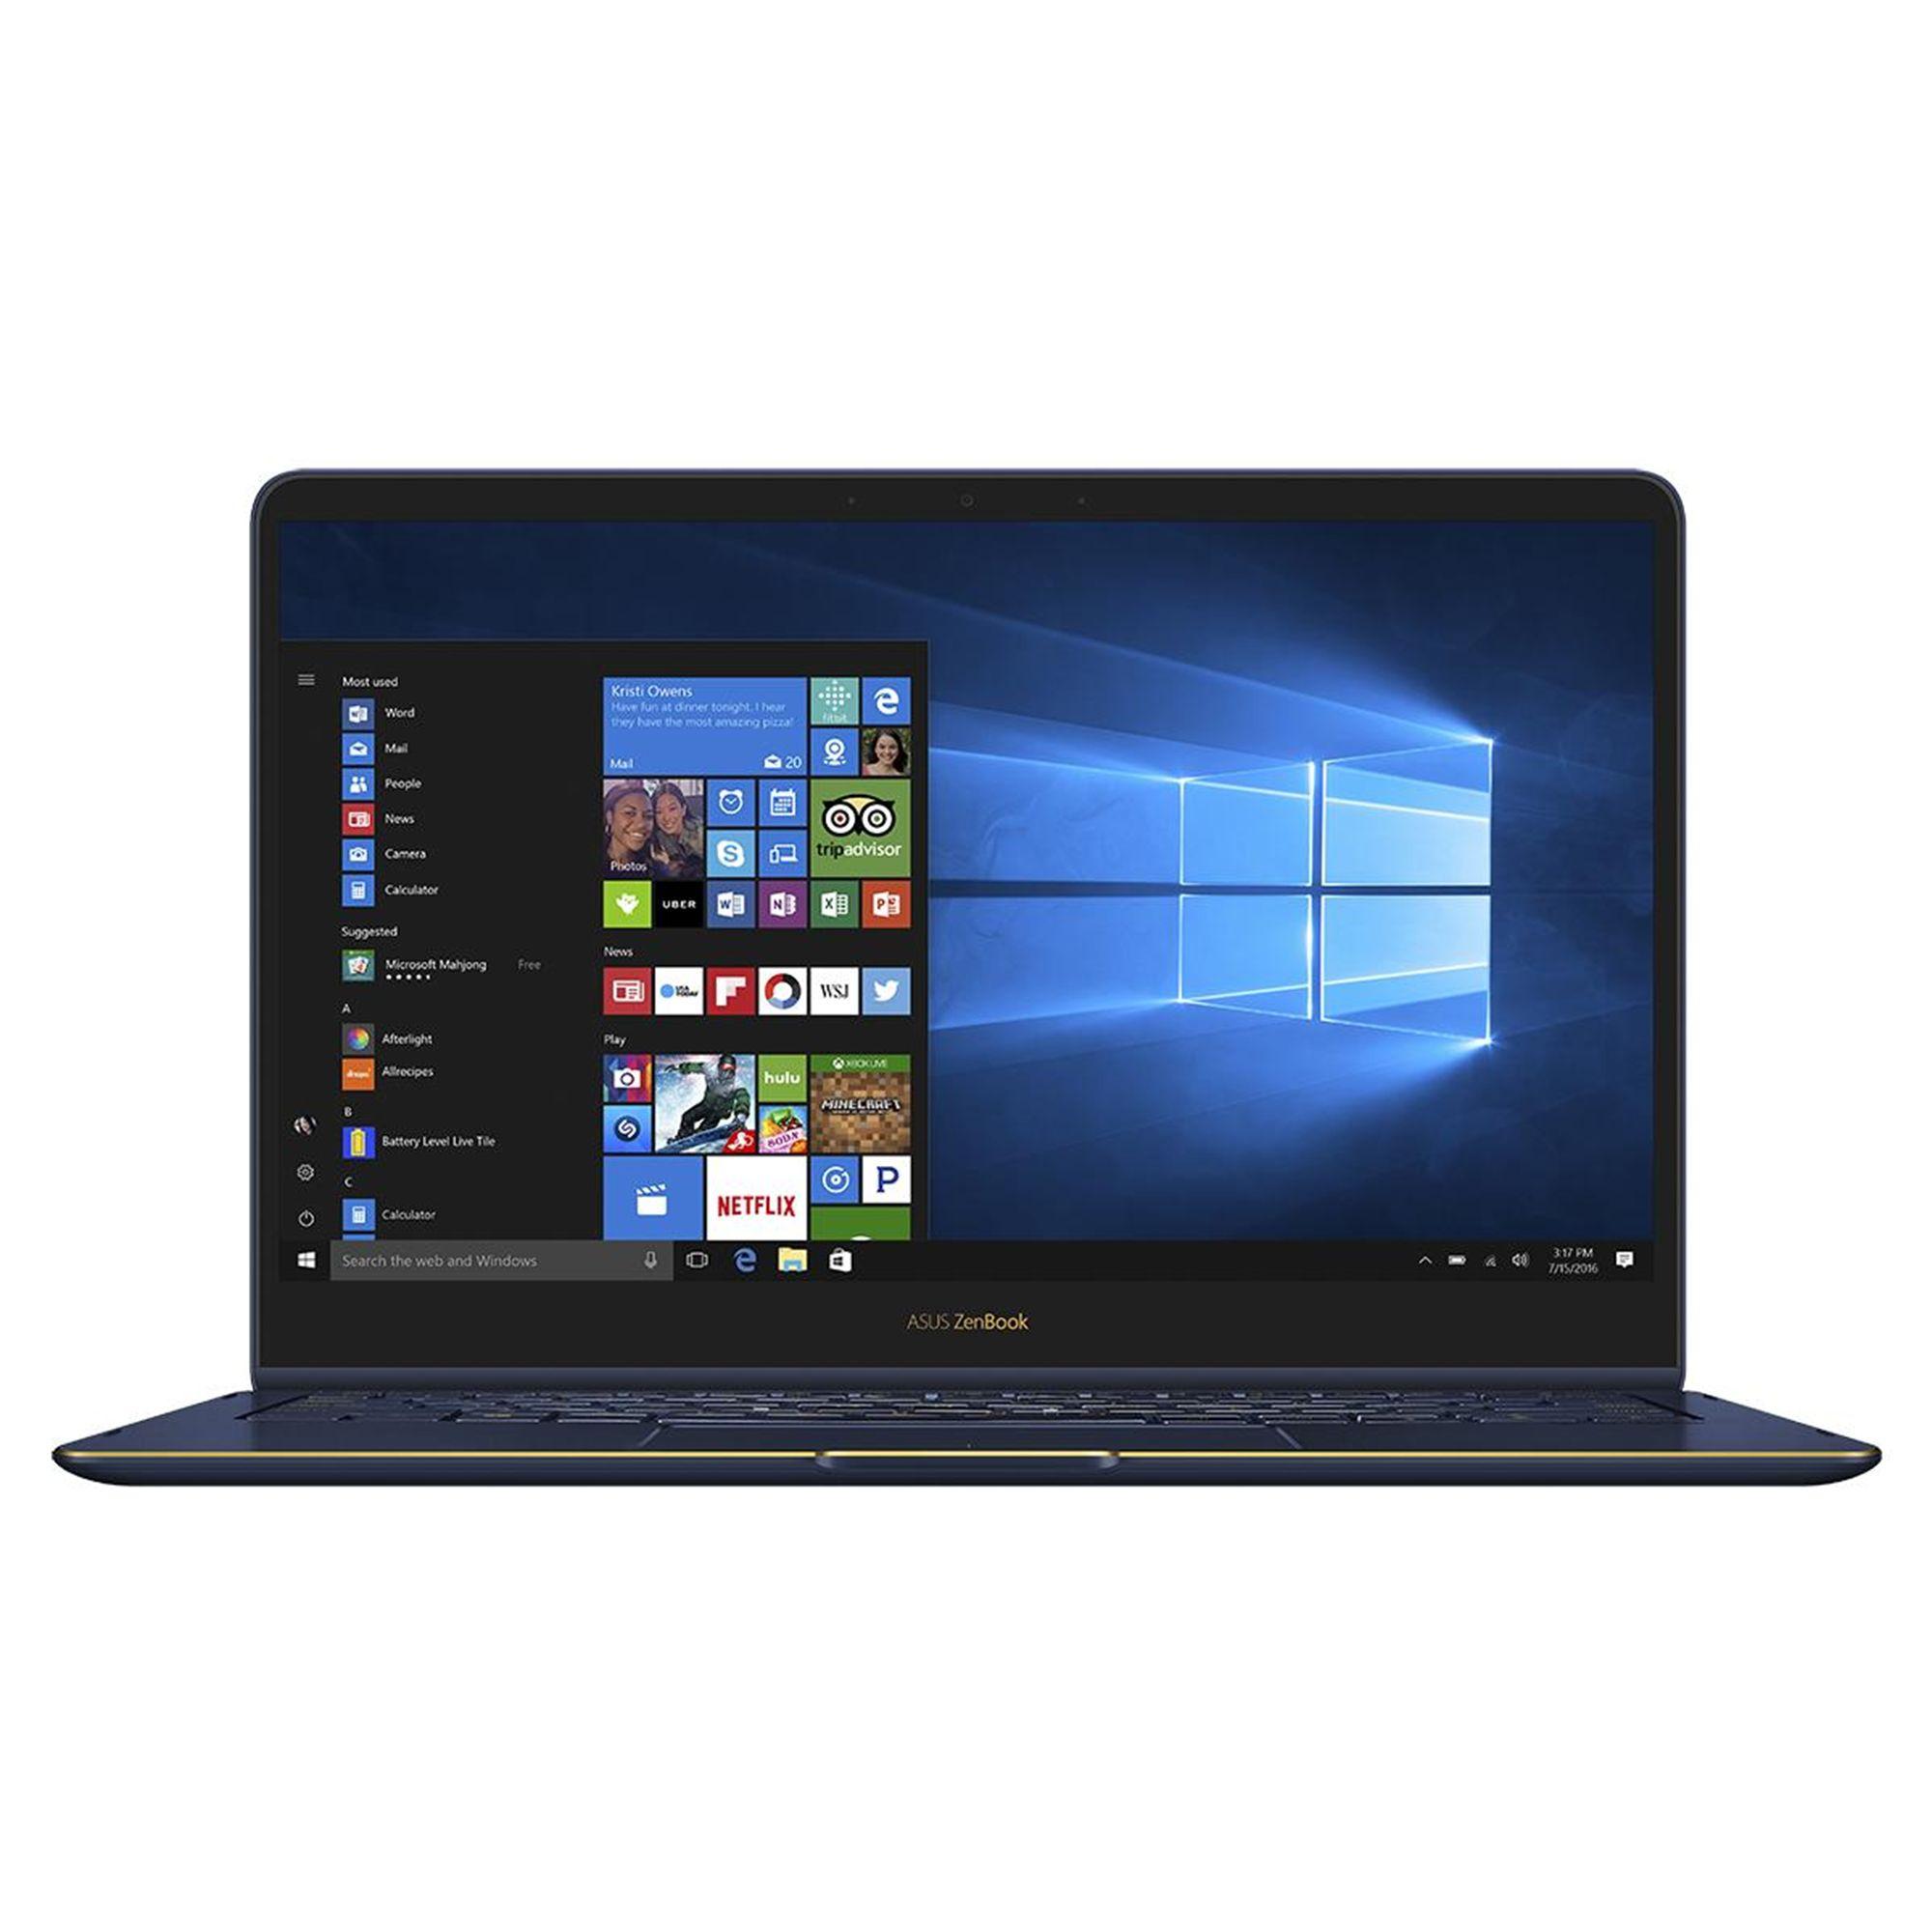 Ultrabook Asus ZenBook Flip S UX370UA 13.3 Full HD Touch Intel Core i7-8550U RAM 16GB SSD 512GB Windows 10 Pro Albastru